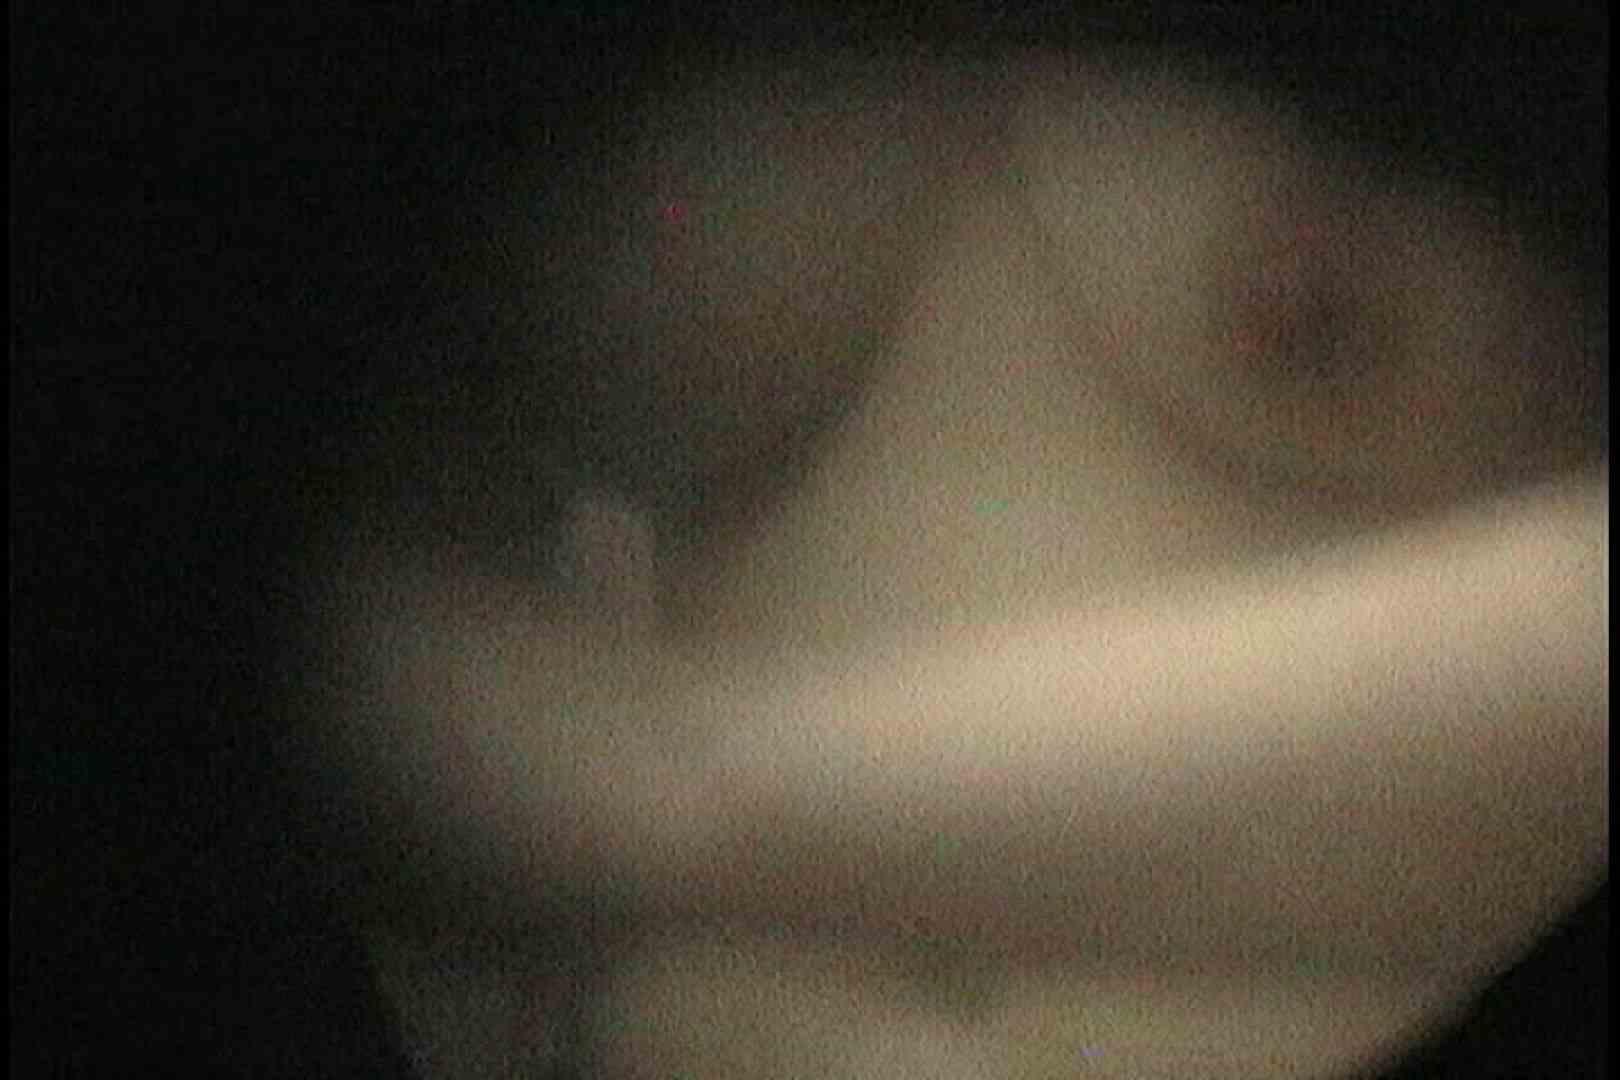 No.68 見事に可愛い巨乳ちゃん 室内暗いです むっちりガール すけべAV動画紹介 79枚 44